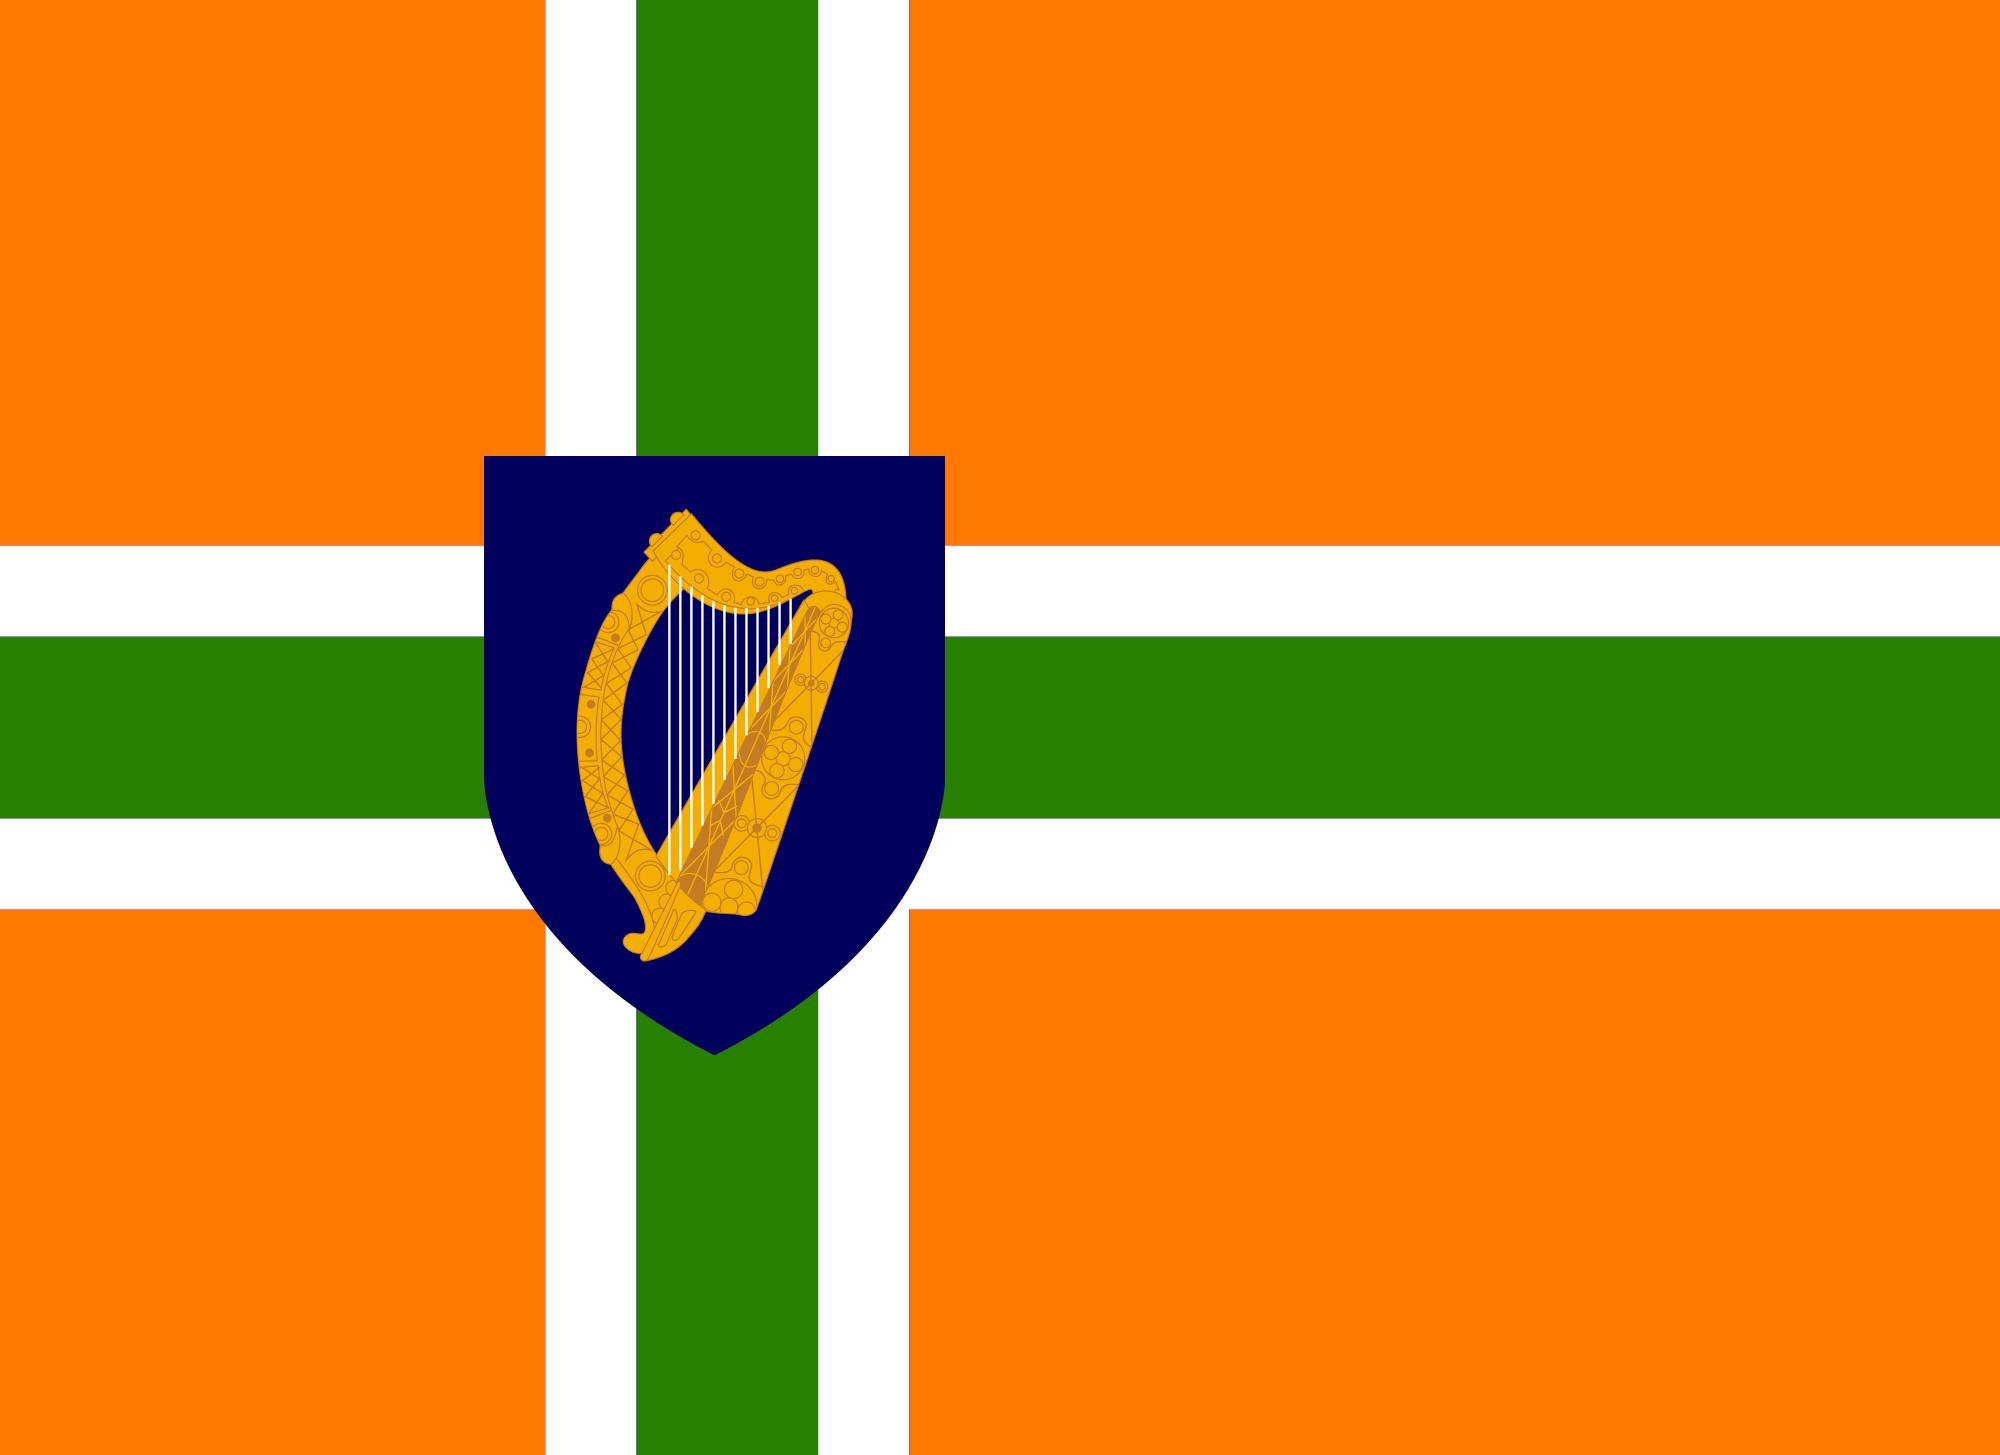 image irish nordic cross flag png alternative history fandom